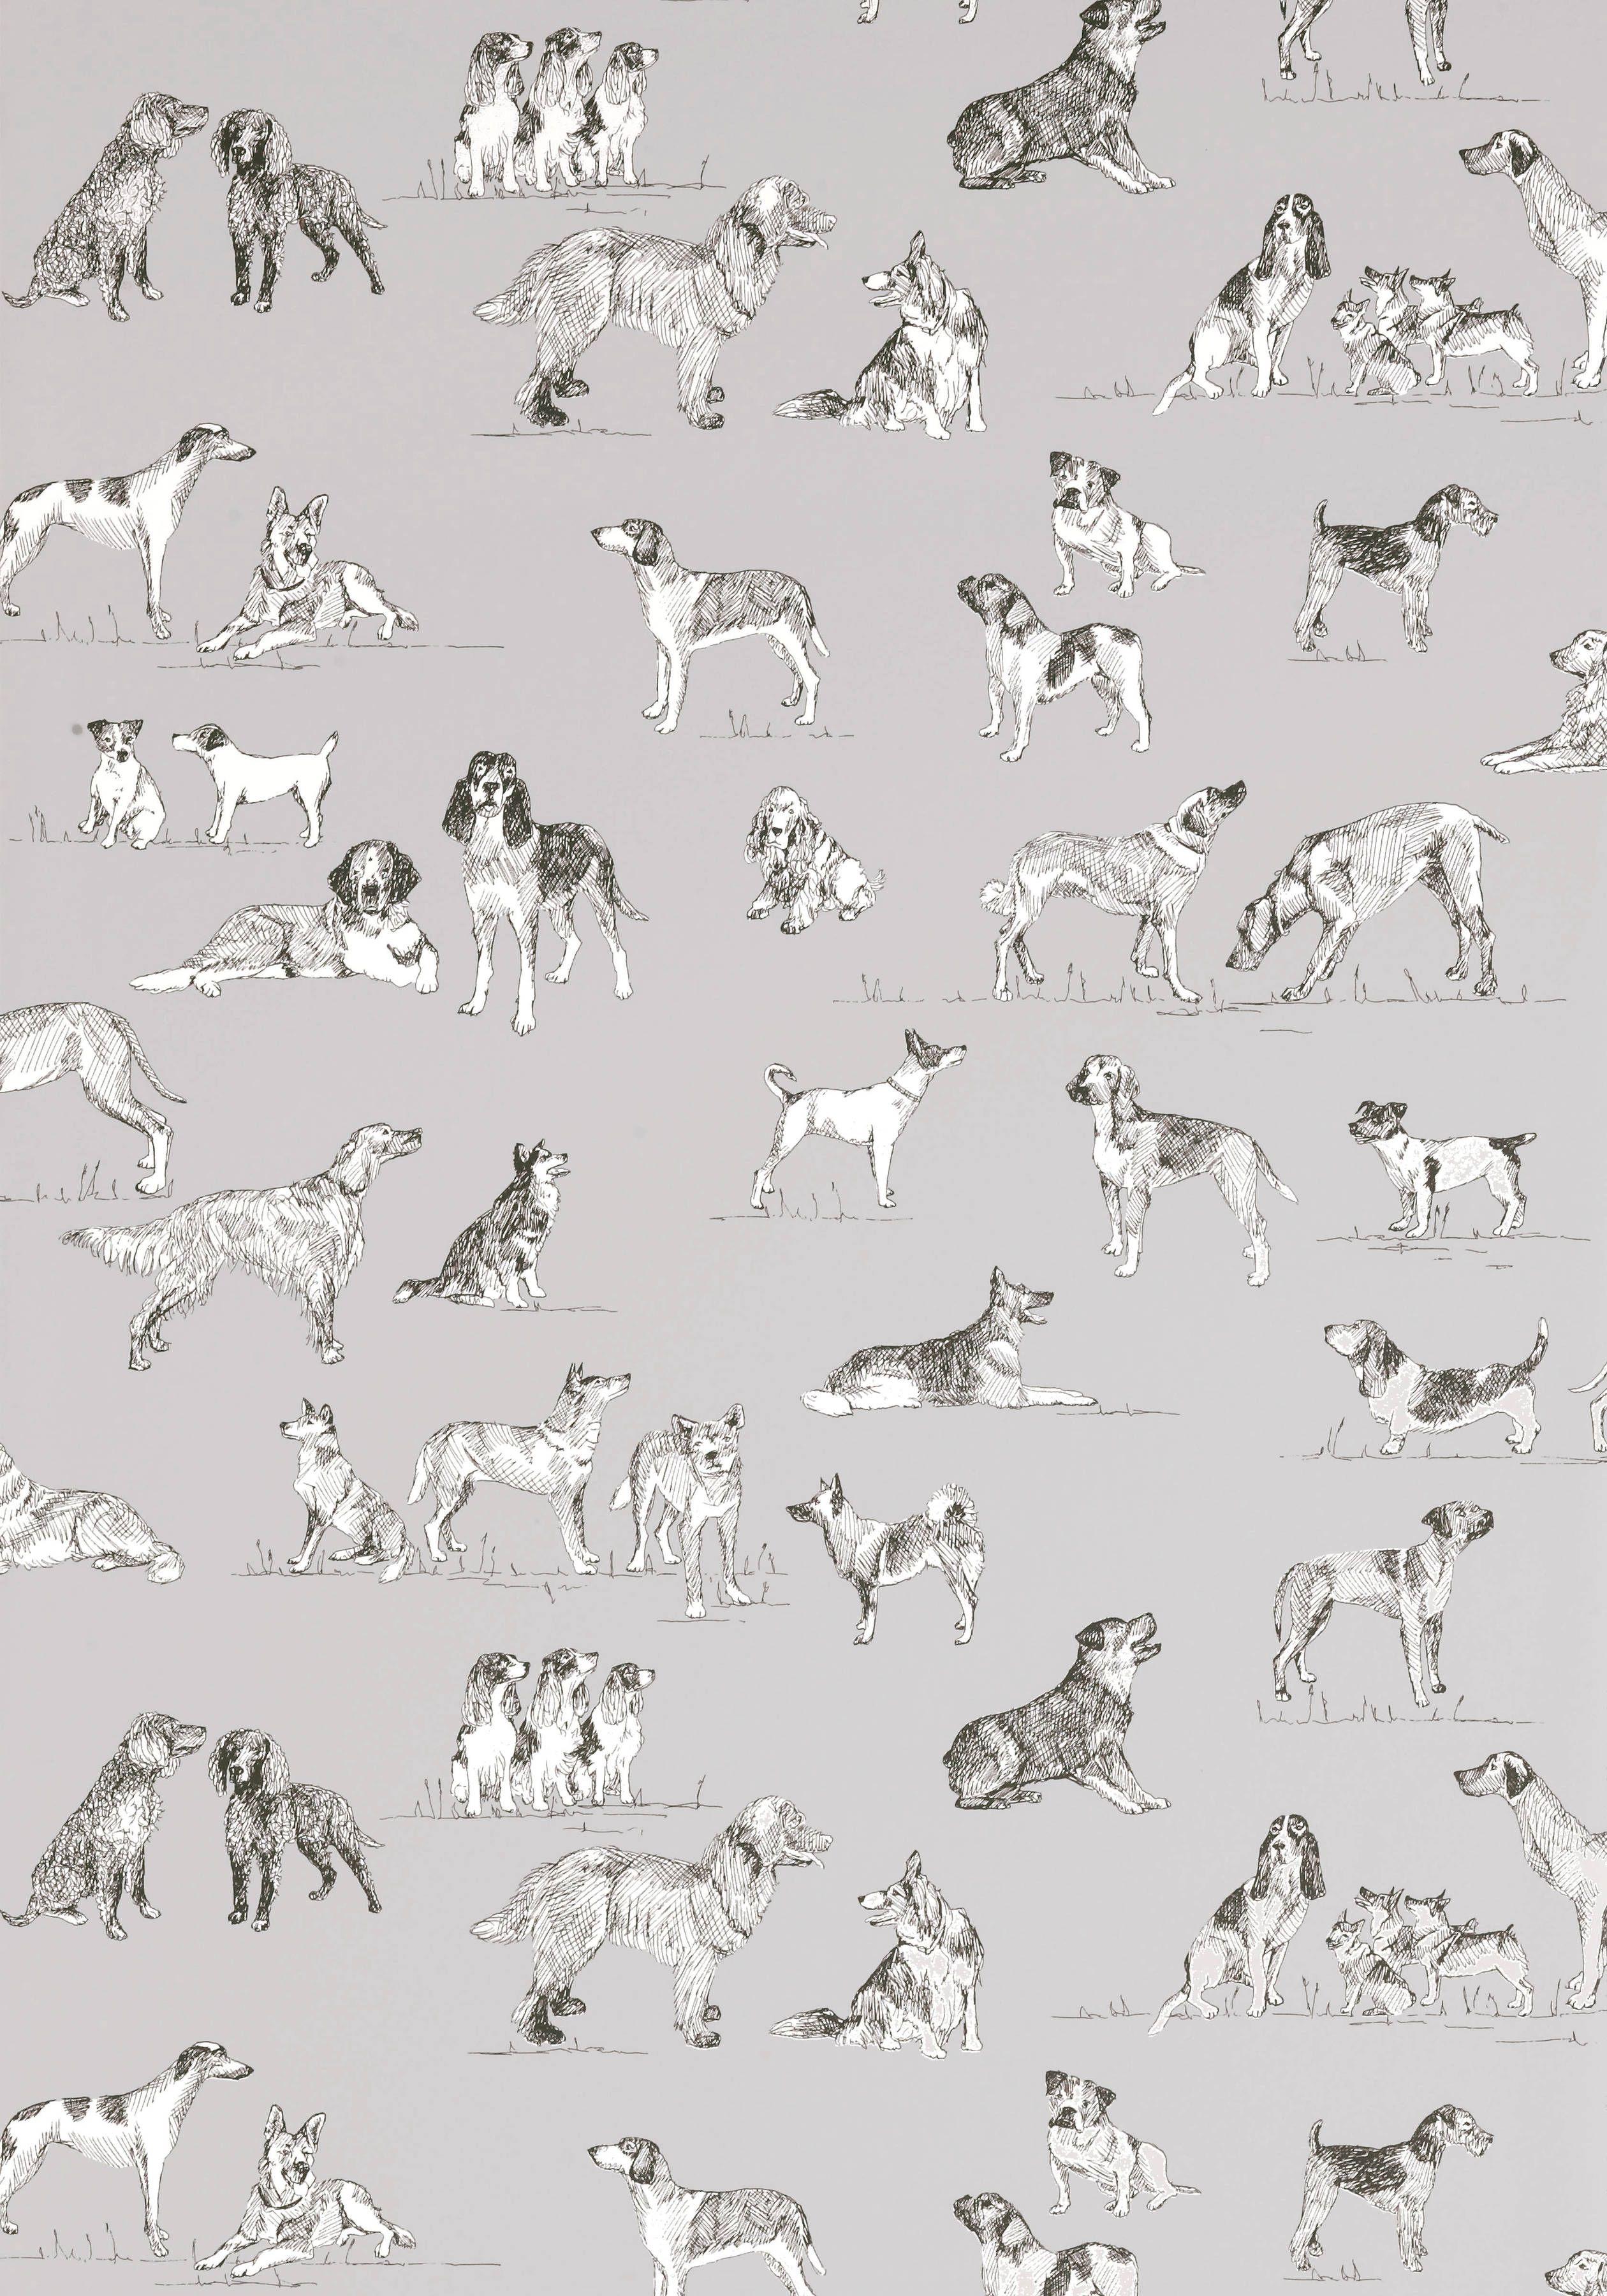 Best Friend Grey T1039 Collection Menswear Resource From Thibaut Best Friend Wallpaper Thibaut Wallpaper Friends Wallpaper